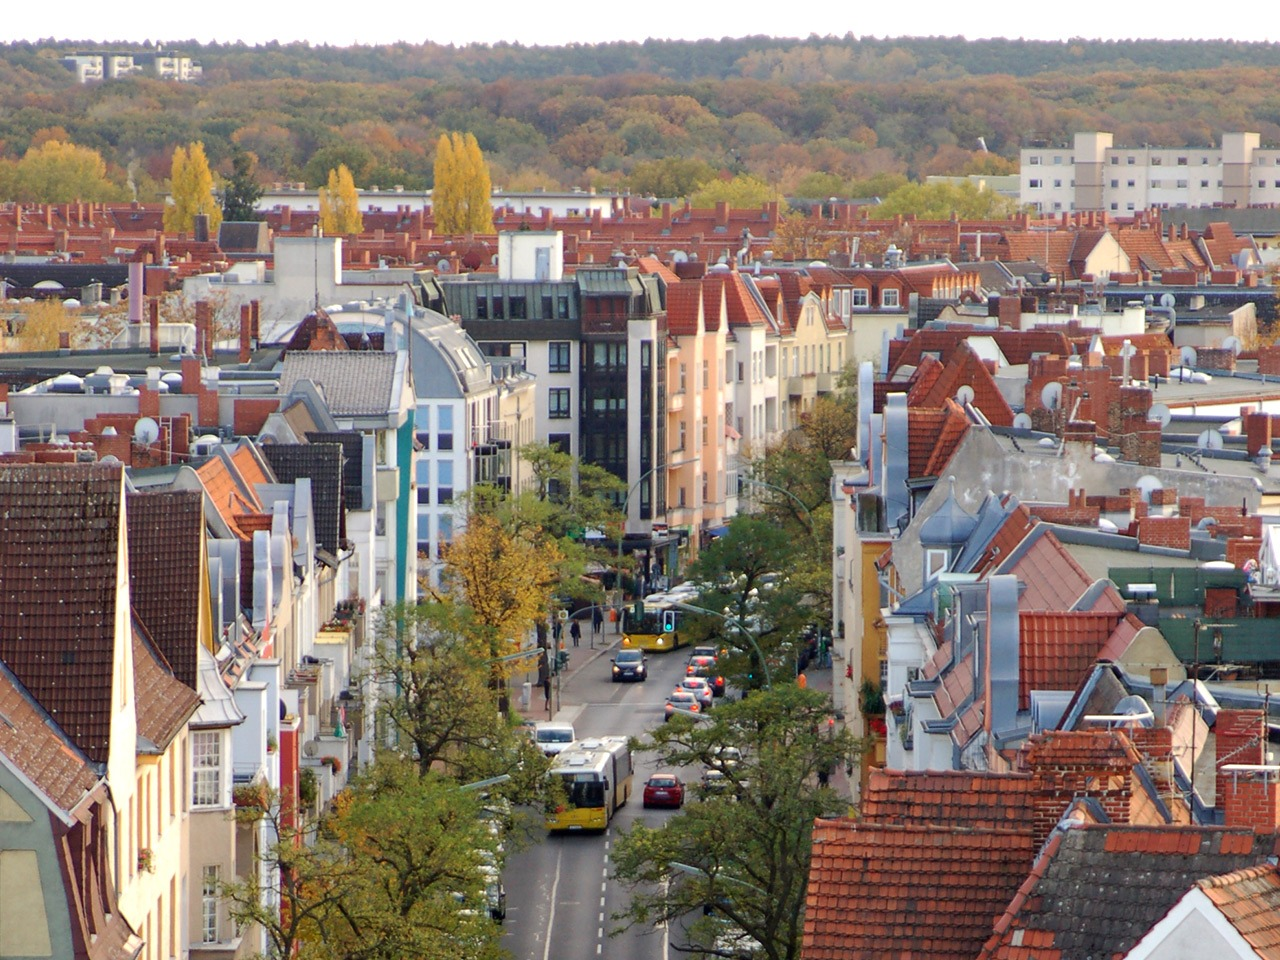 Verkehrsbaumaßnahmen Pichelsdorfer Straße, Götel- und Betckestraße